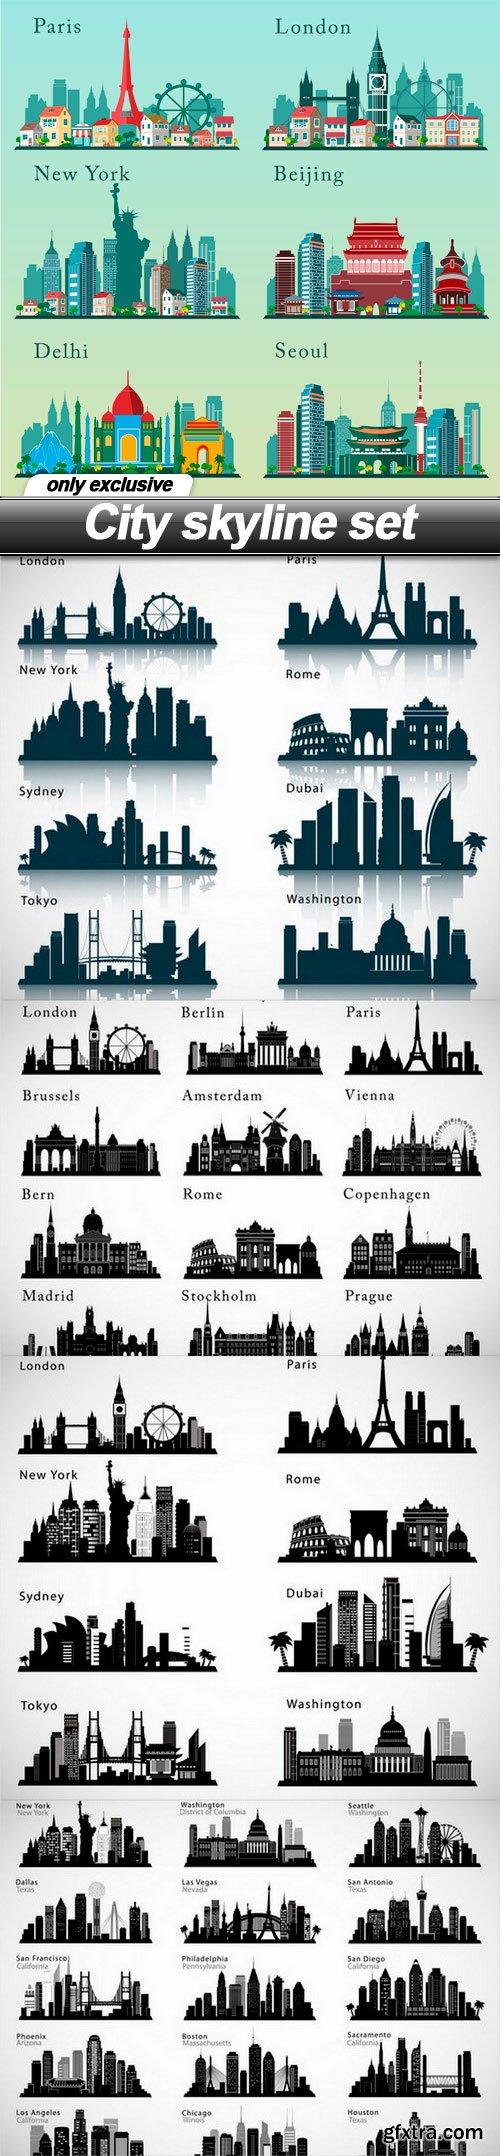 City skyline set - 5 EPS